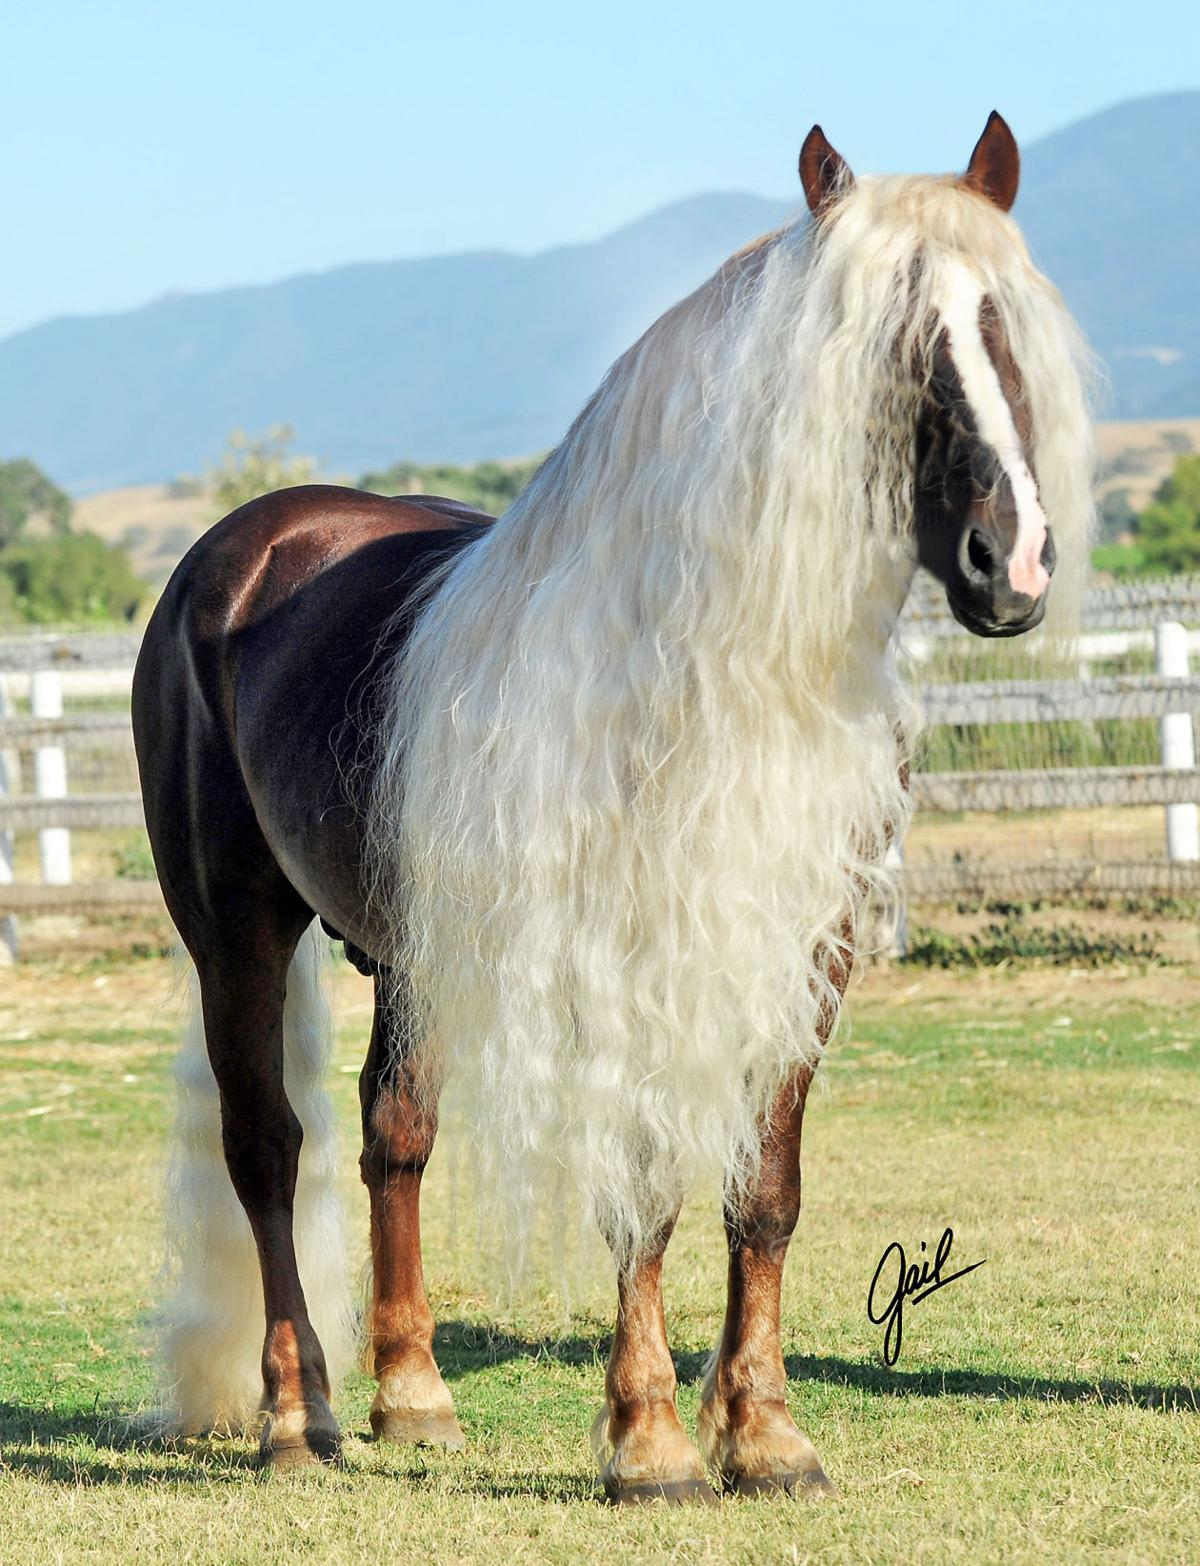 Spectacular horses